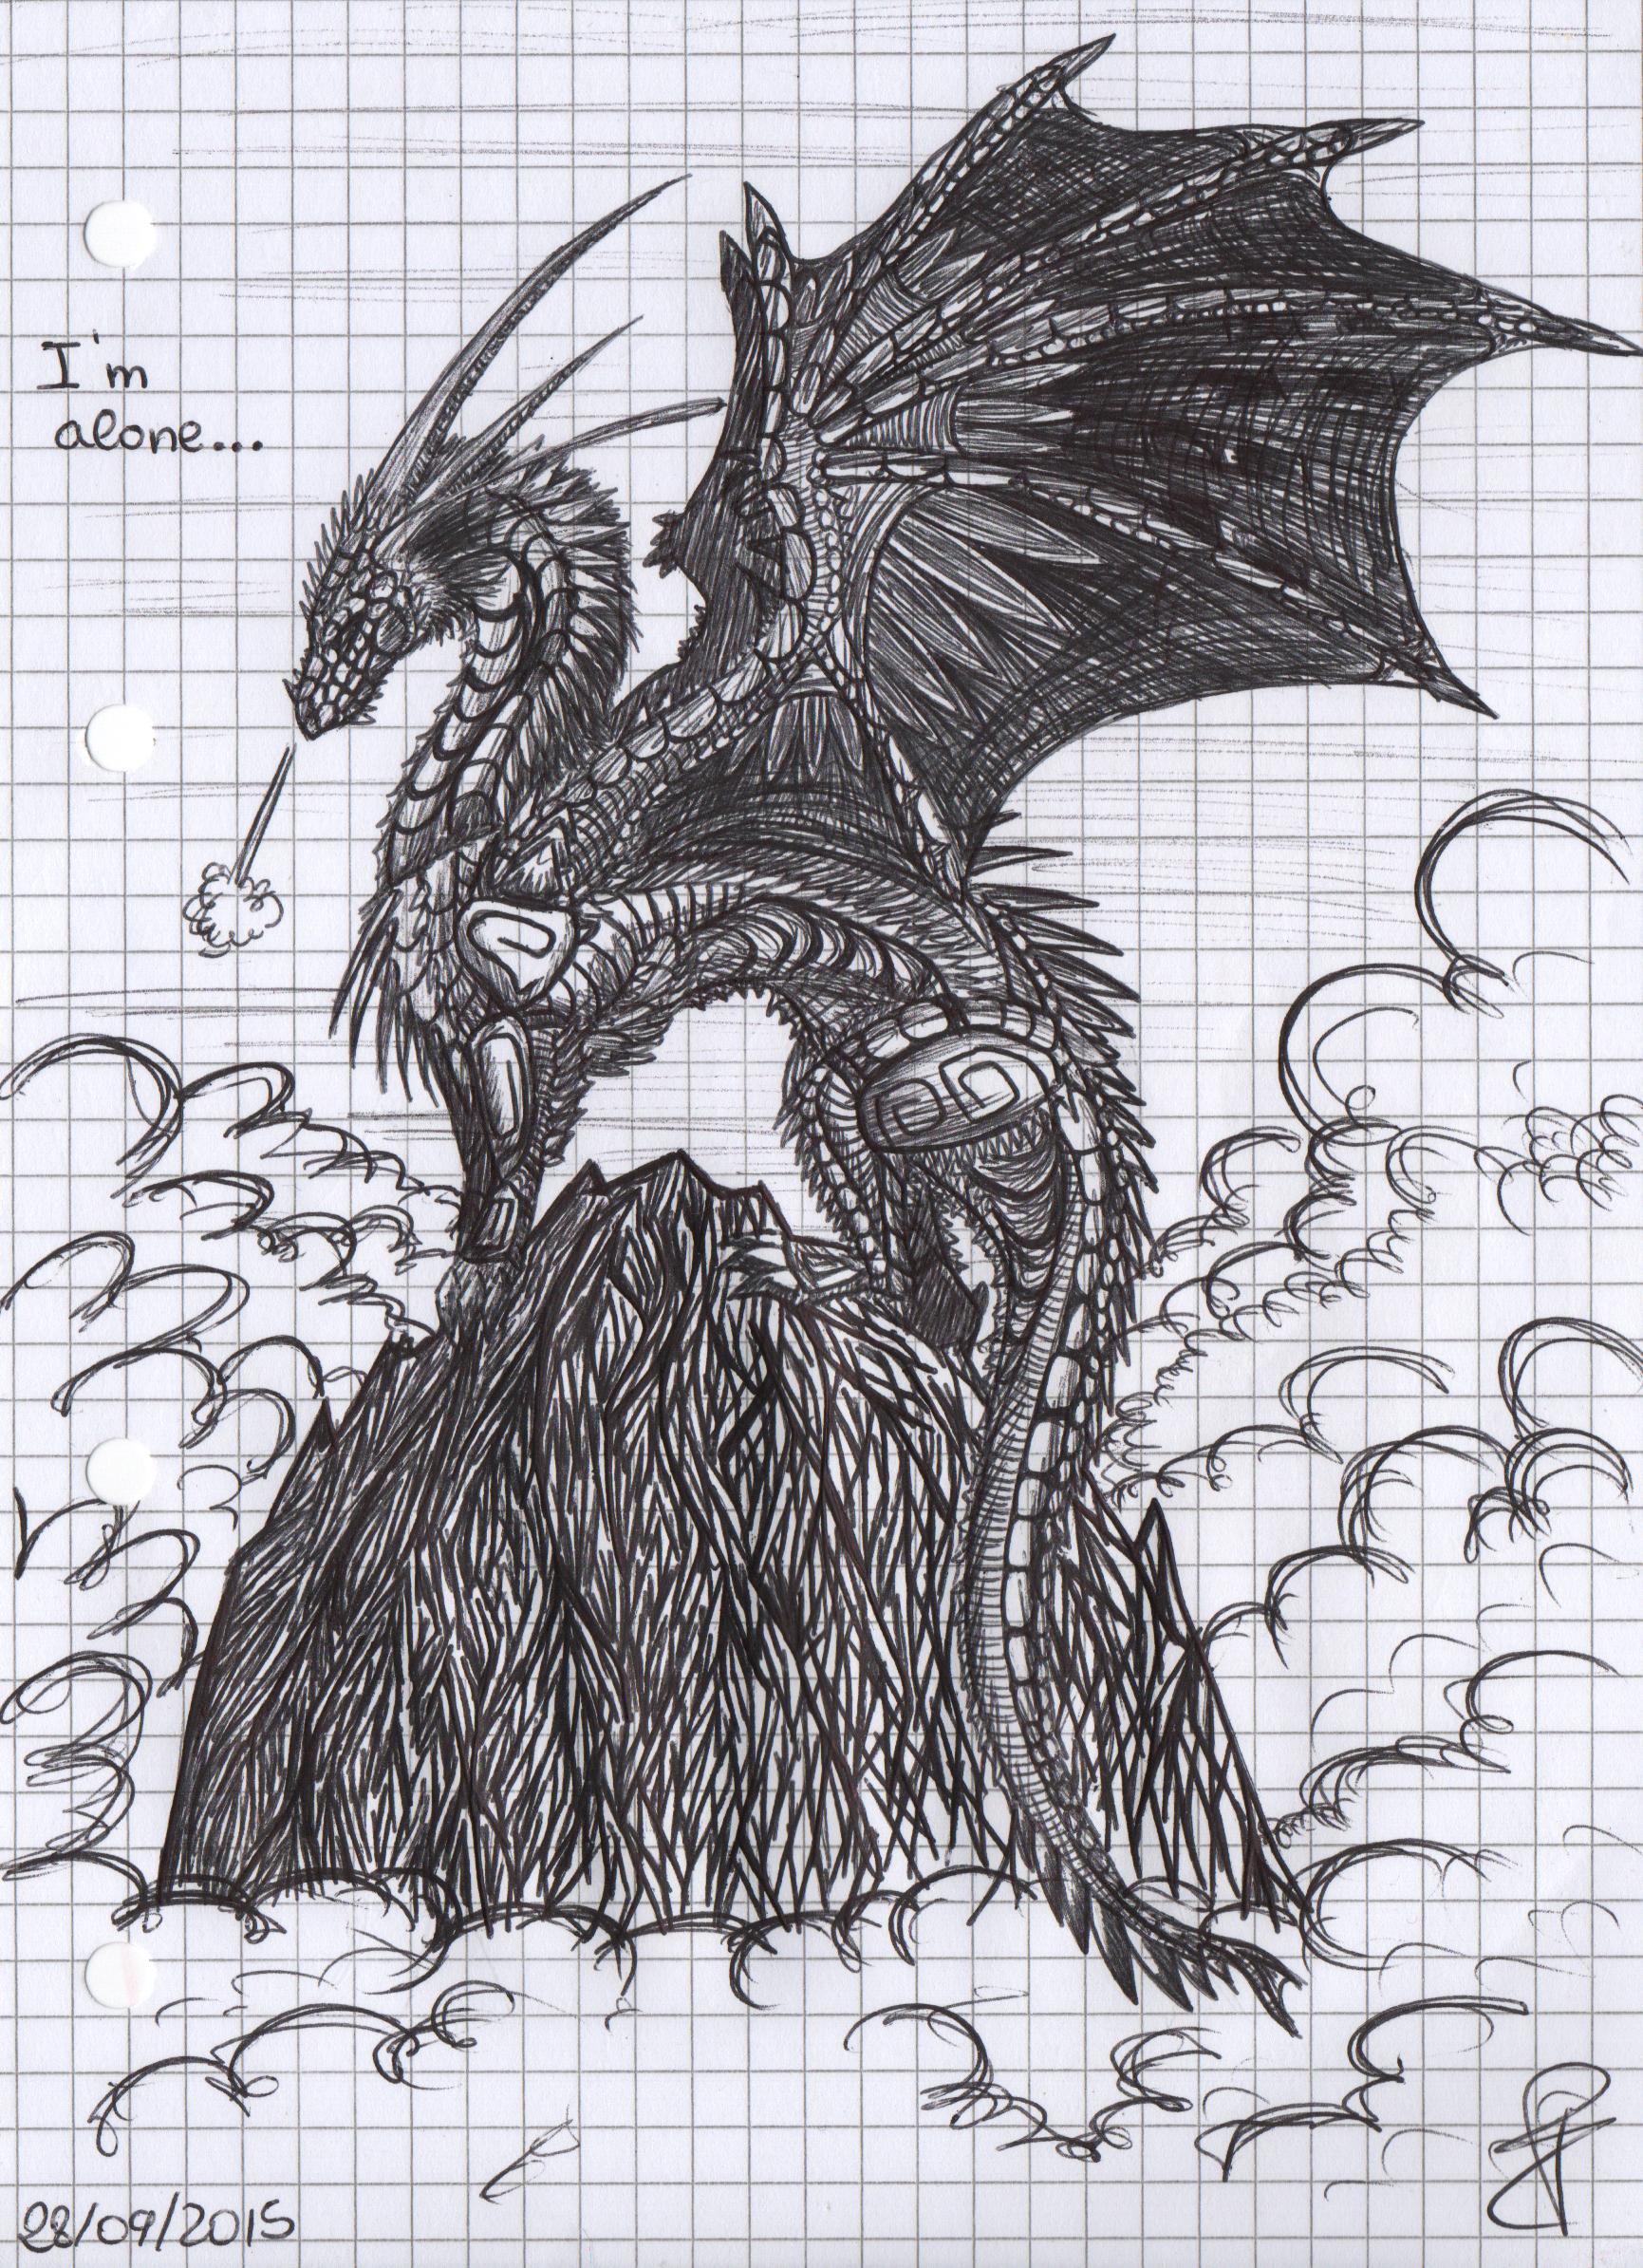 Im alone old pen mandalha drawing